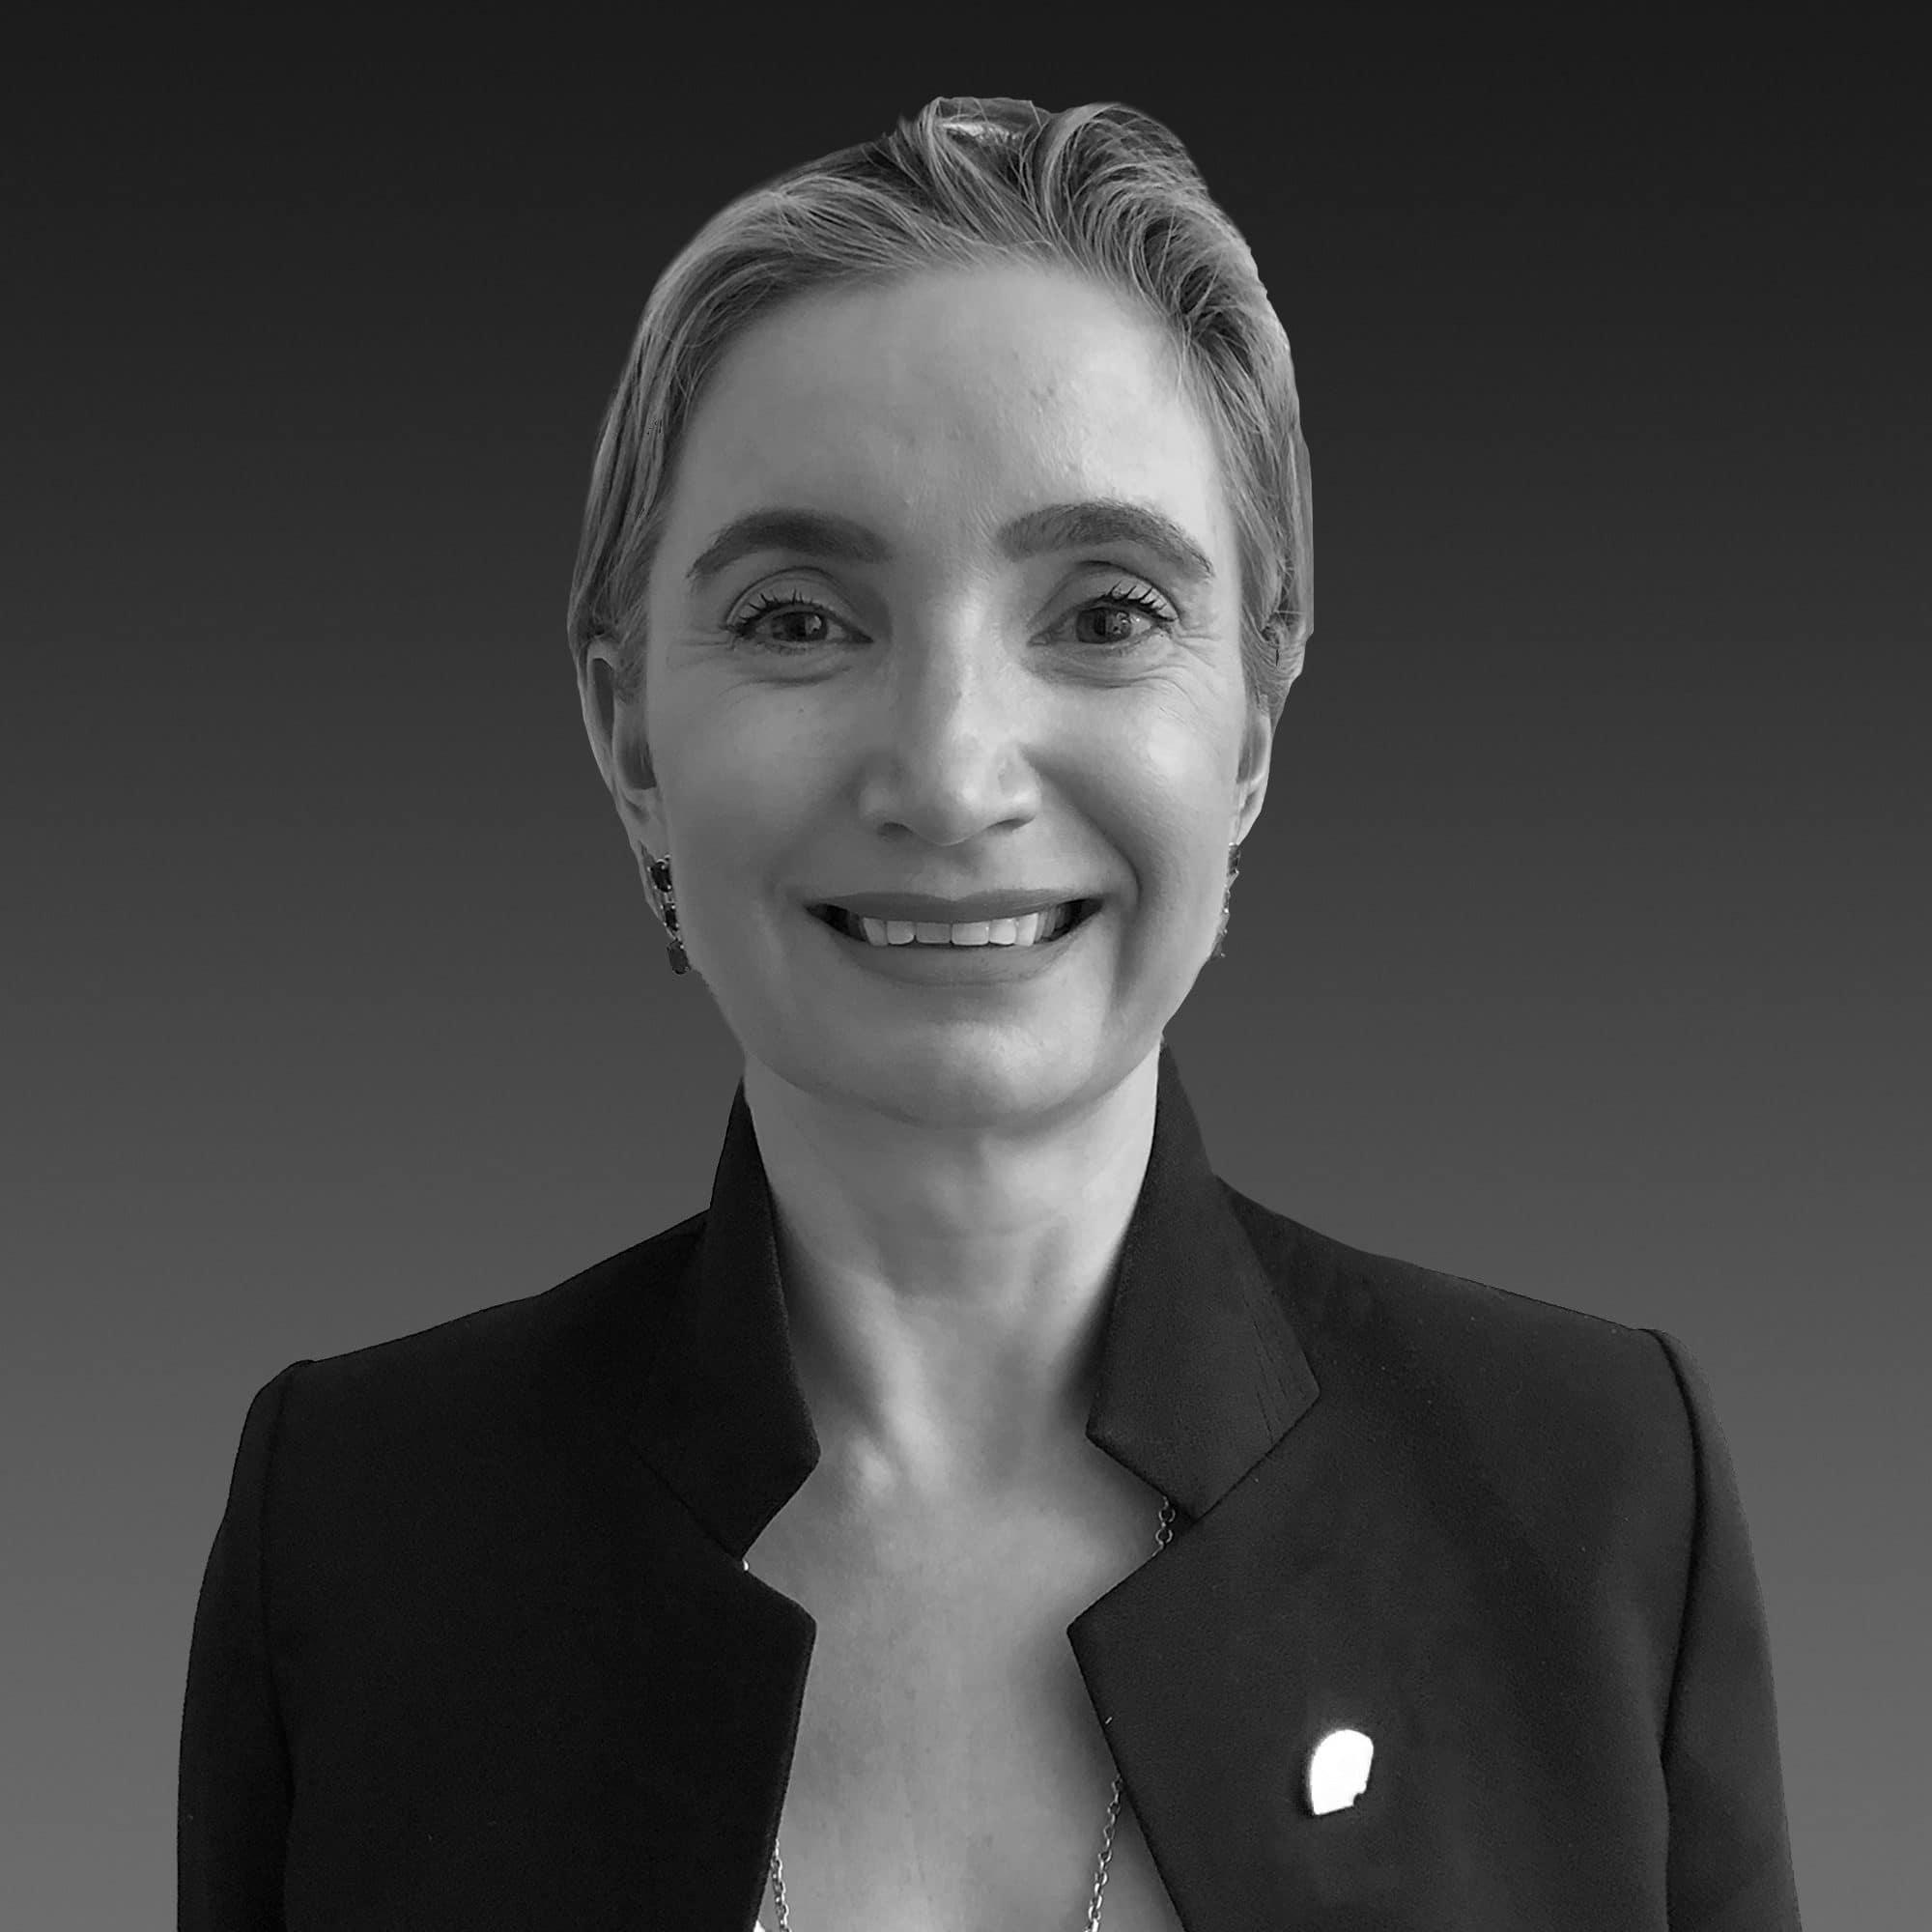 Katerina Fricova